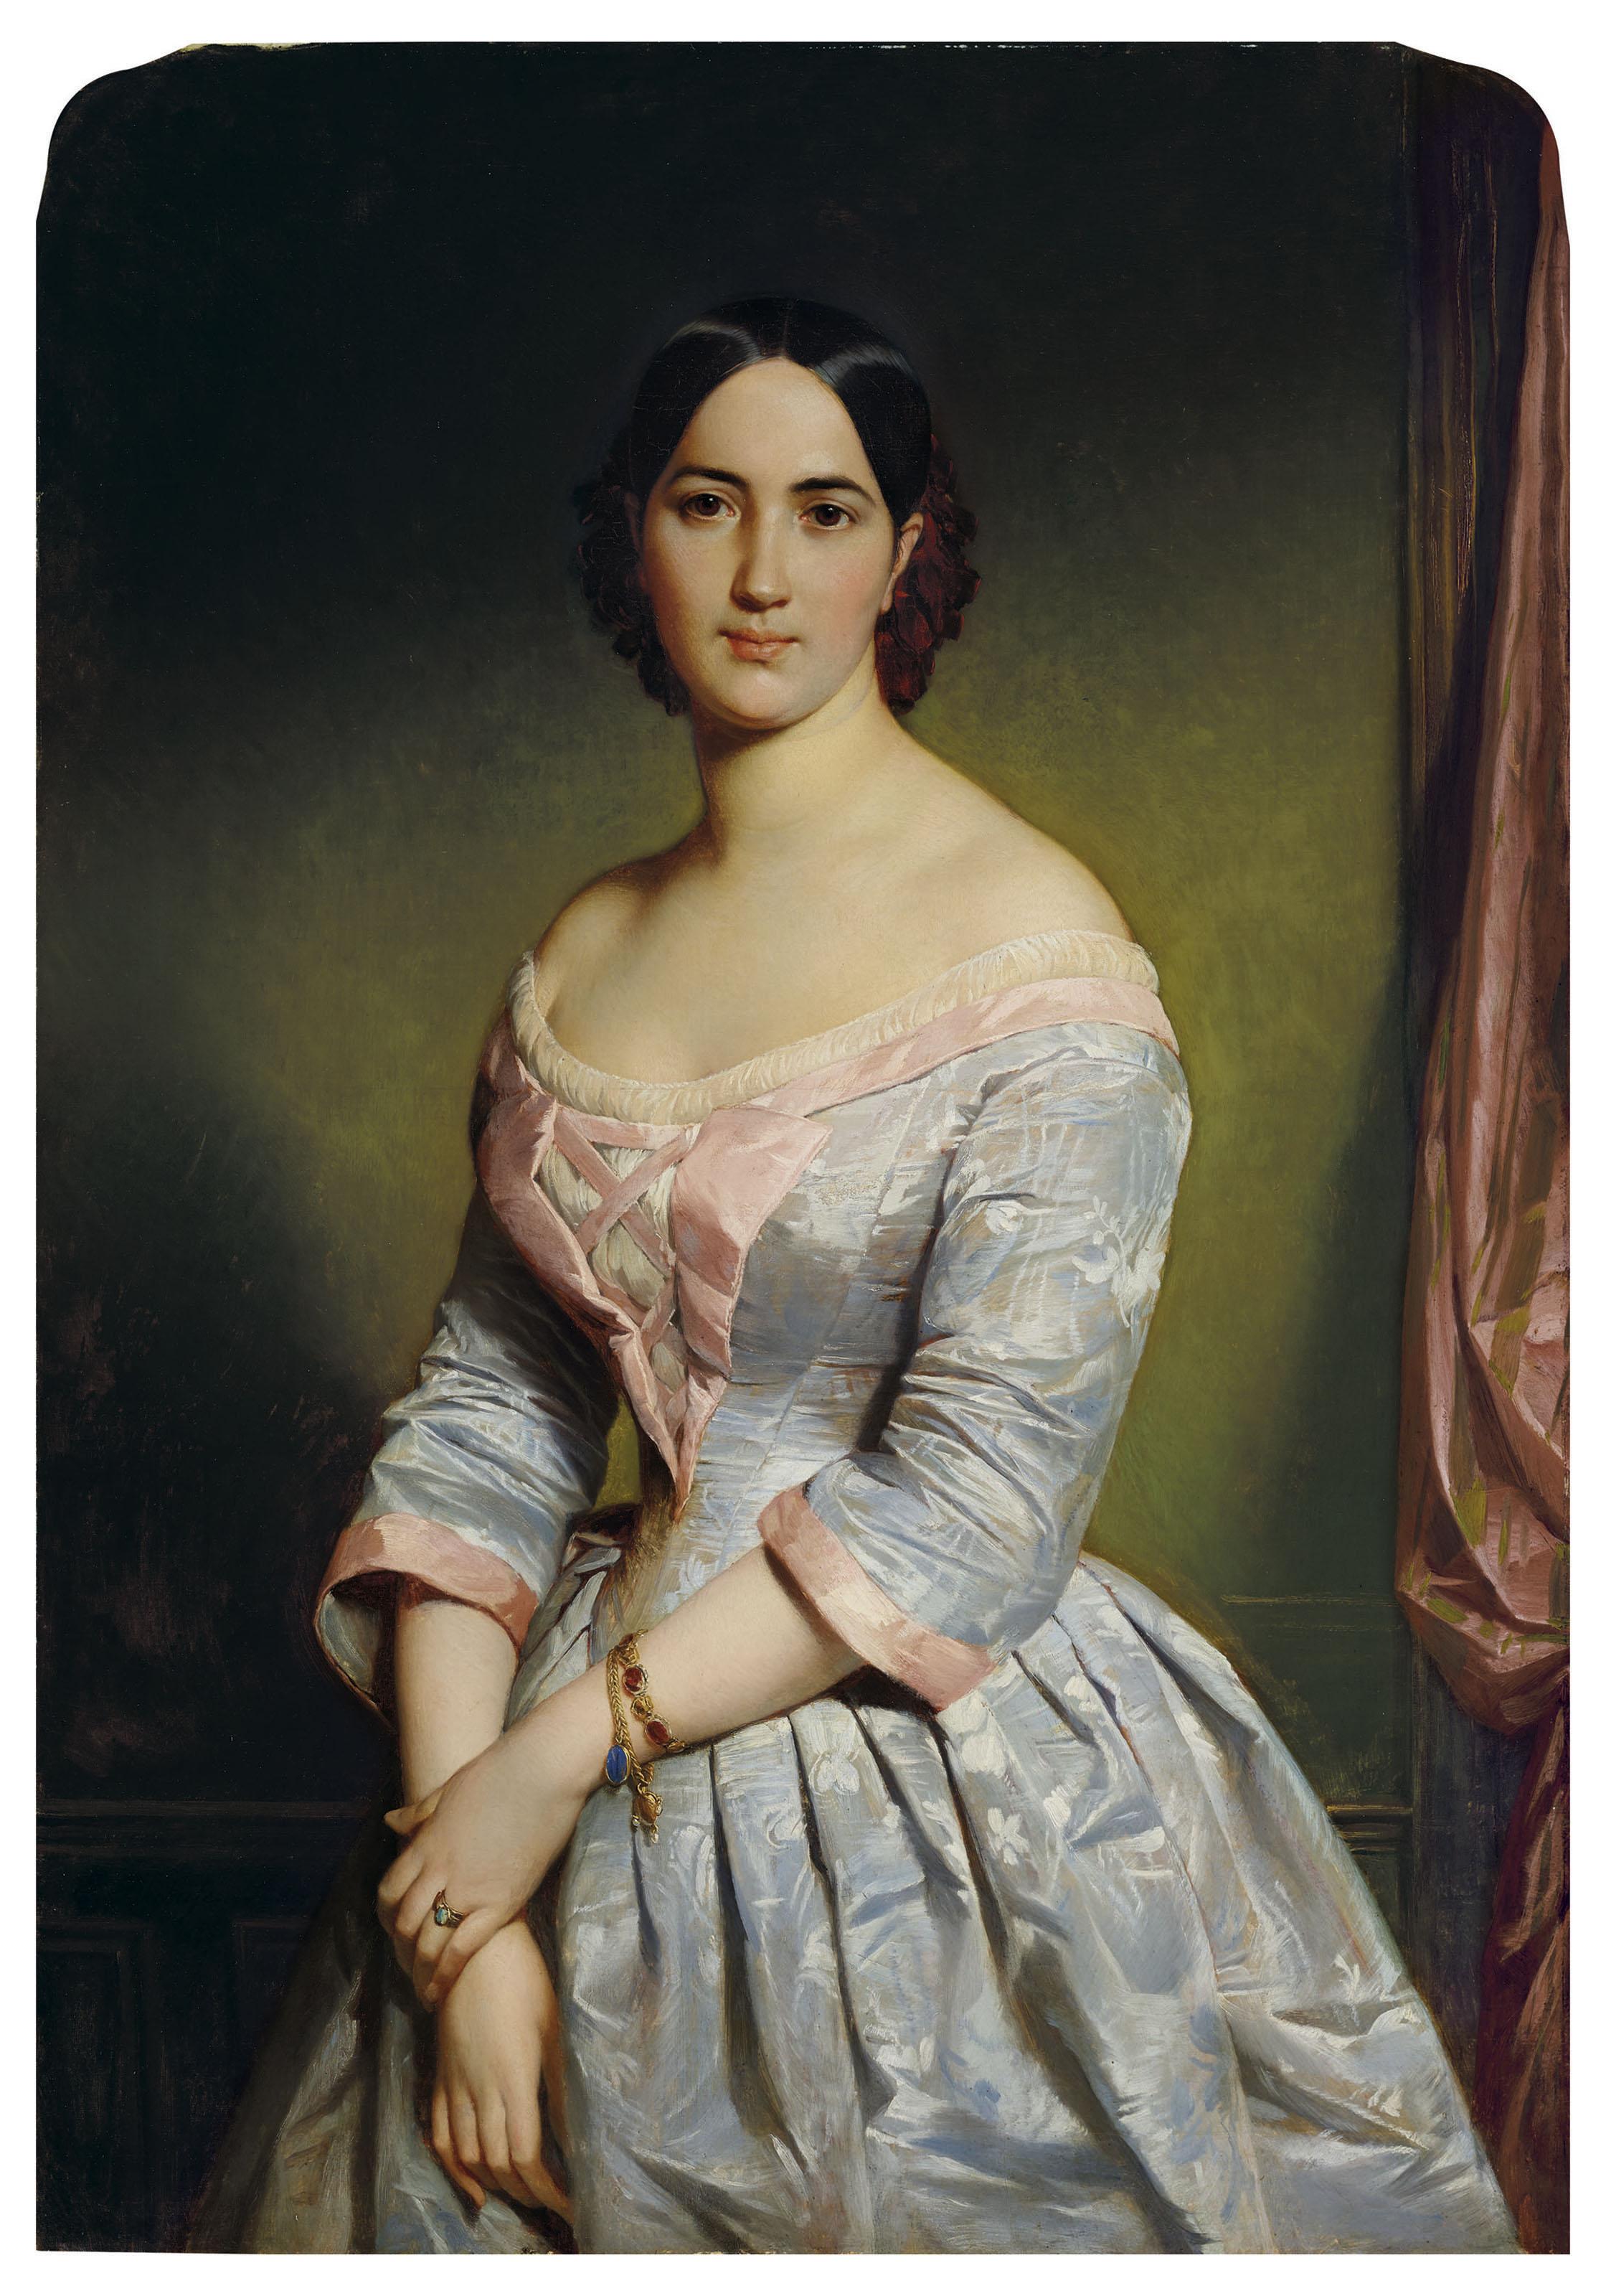 Édouard-Louis Dubufe (French, 1820-1883)